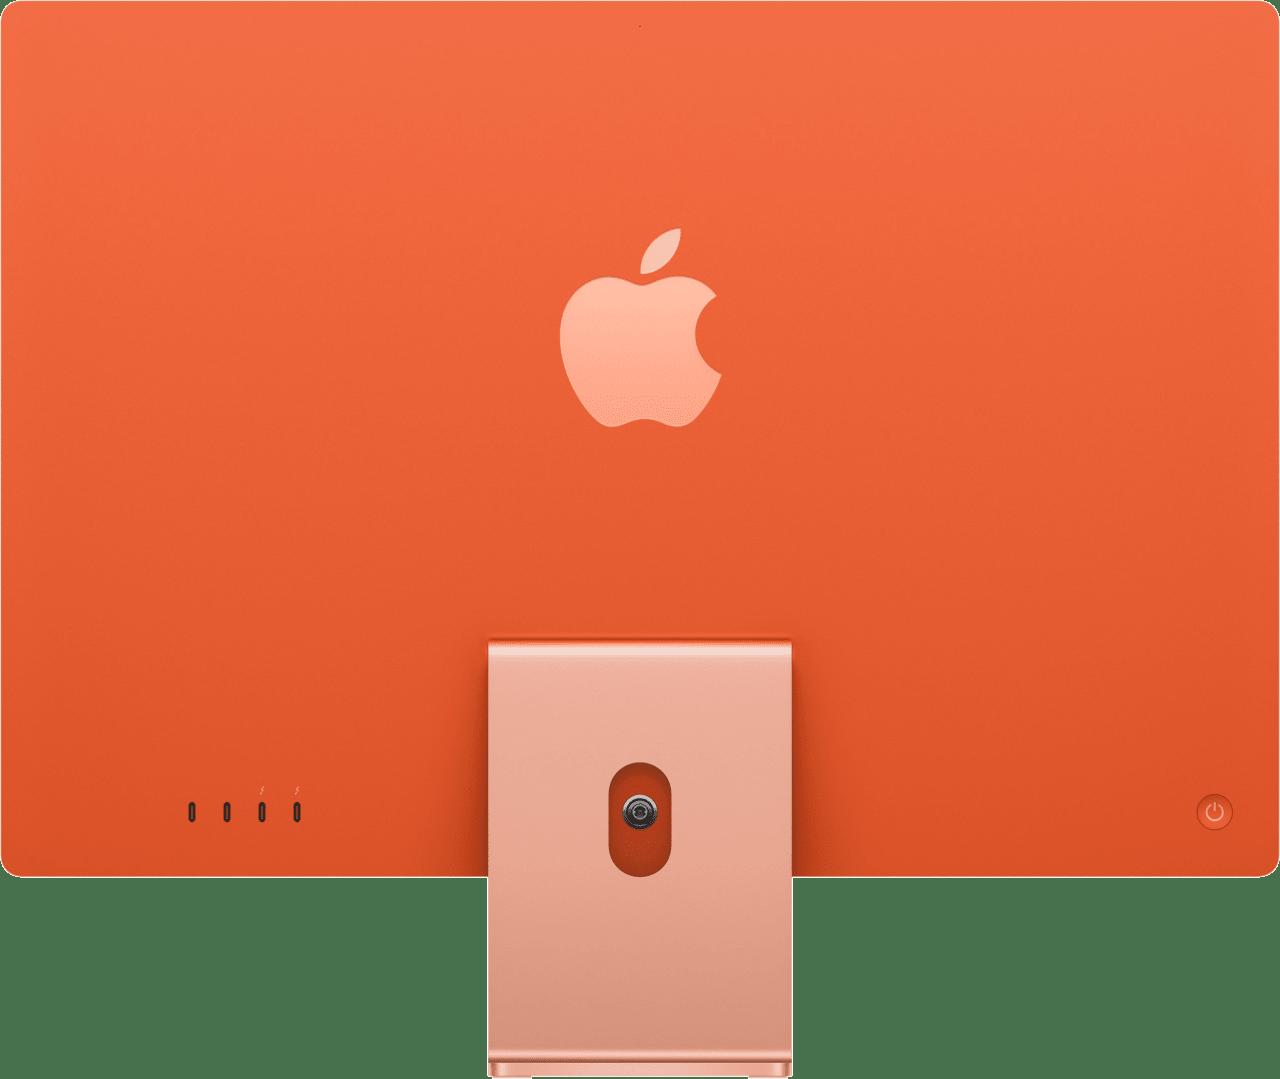 "Orange Apple 24"" iMac (Mid 2021) All-in-One - Apple M1 - 8GB - 256GB SSD - Apple Integrated 8-core GPU.2"